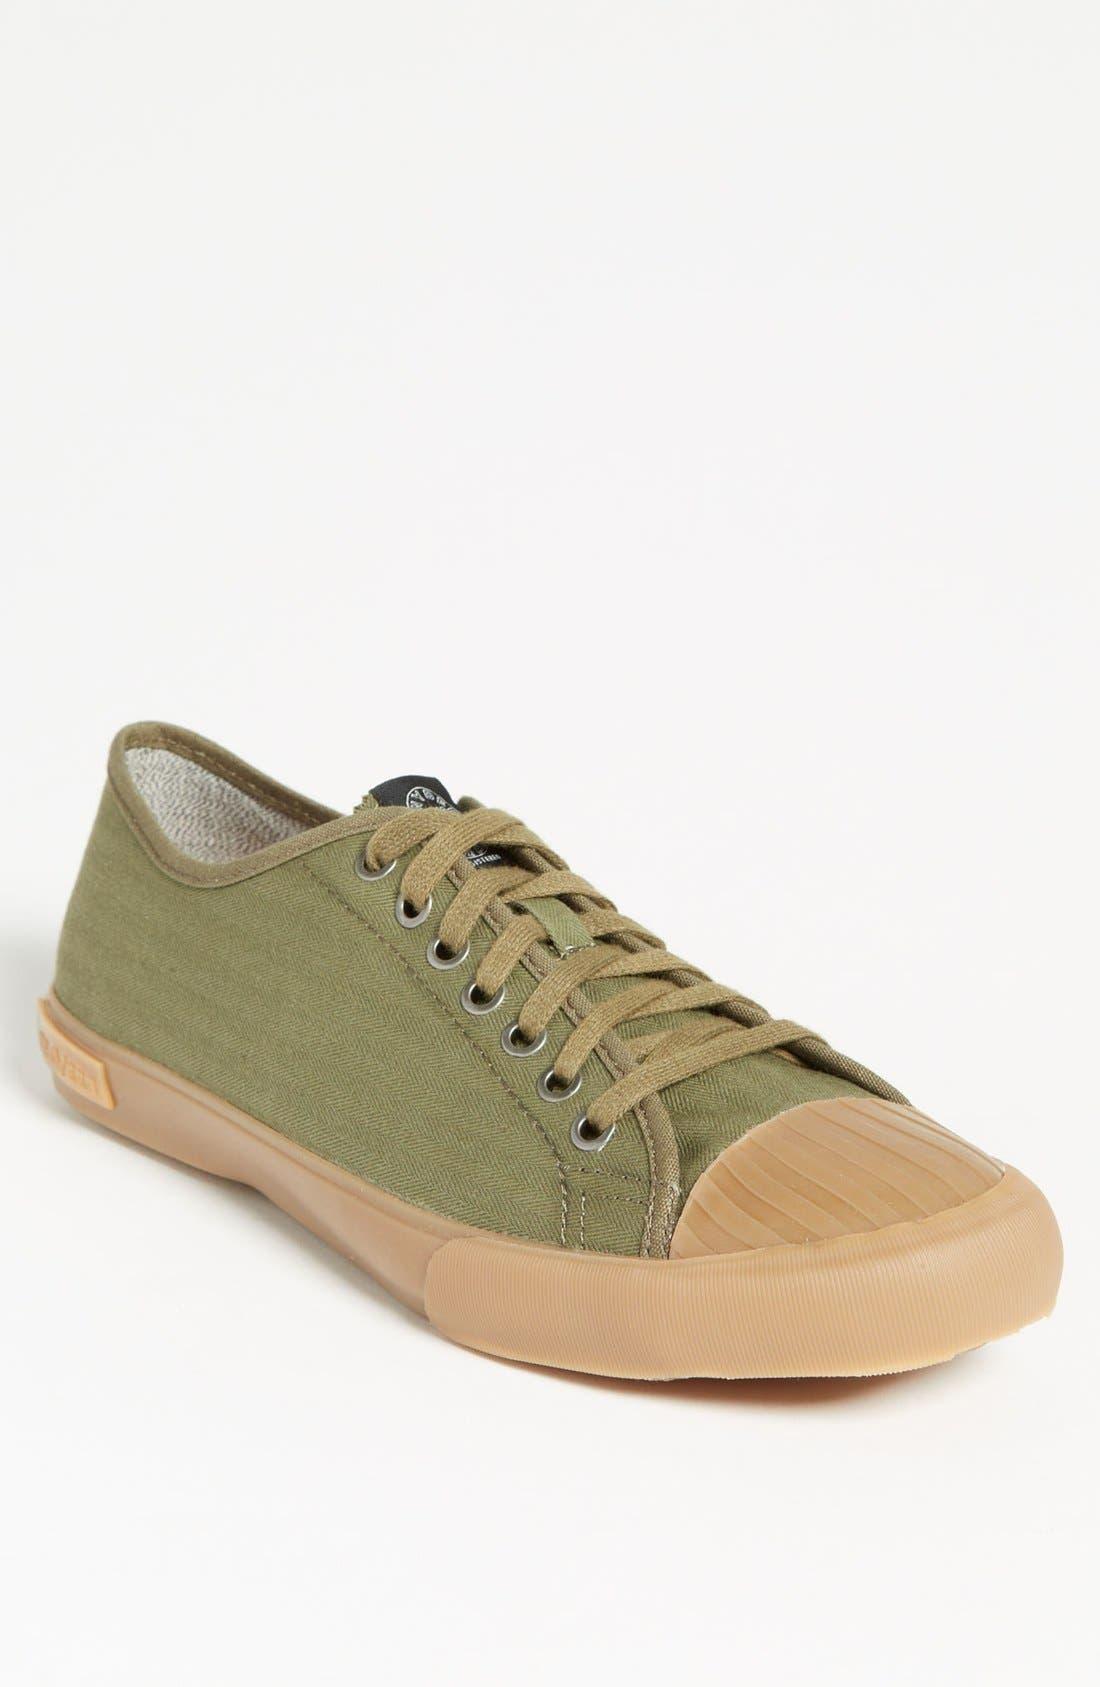 Alternate Image 1 Selected - SeaVees '08/61 Army Issue' Low Sneaker